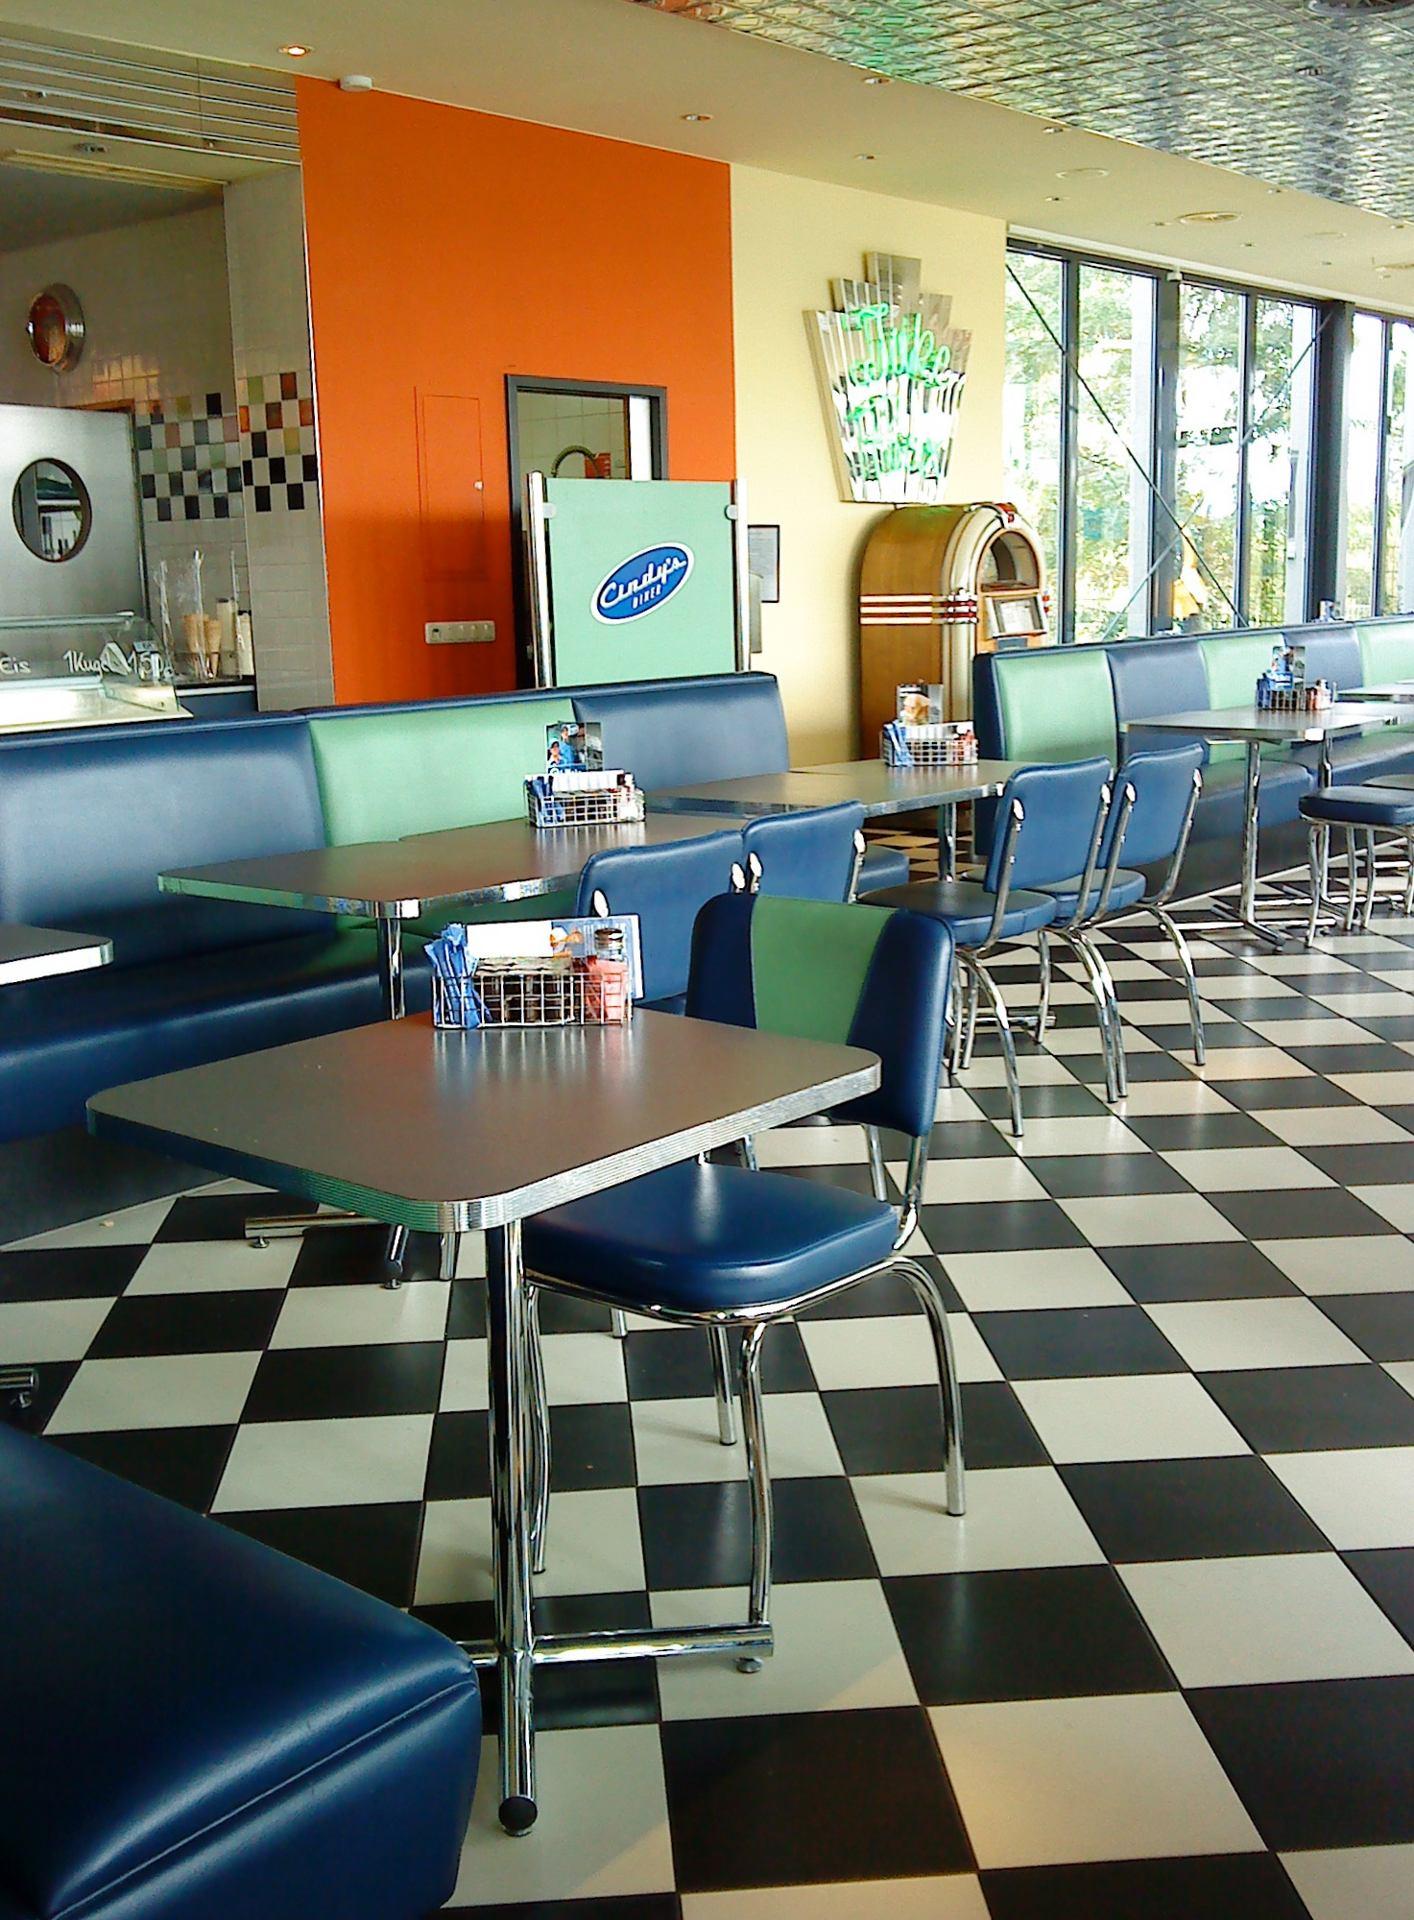 Cindy's diner (Ex Allemagne de l'est)